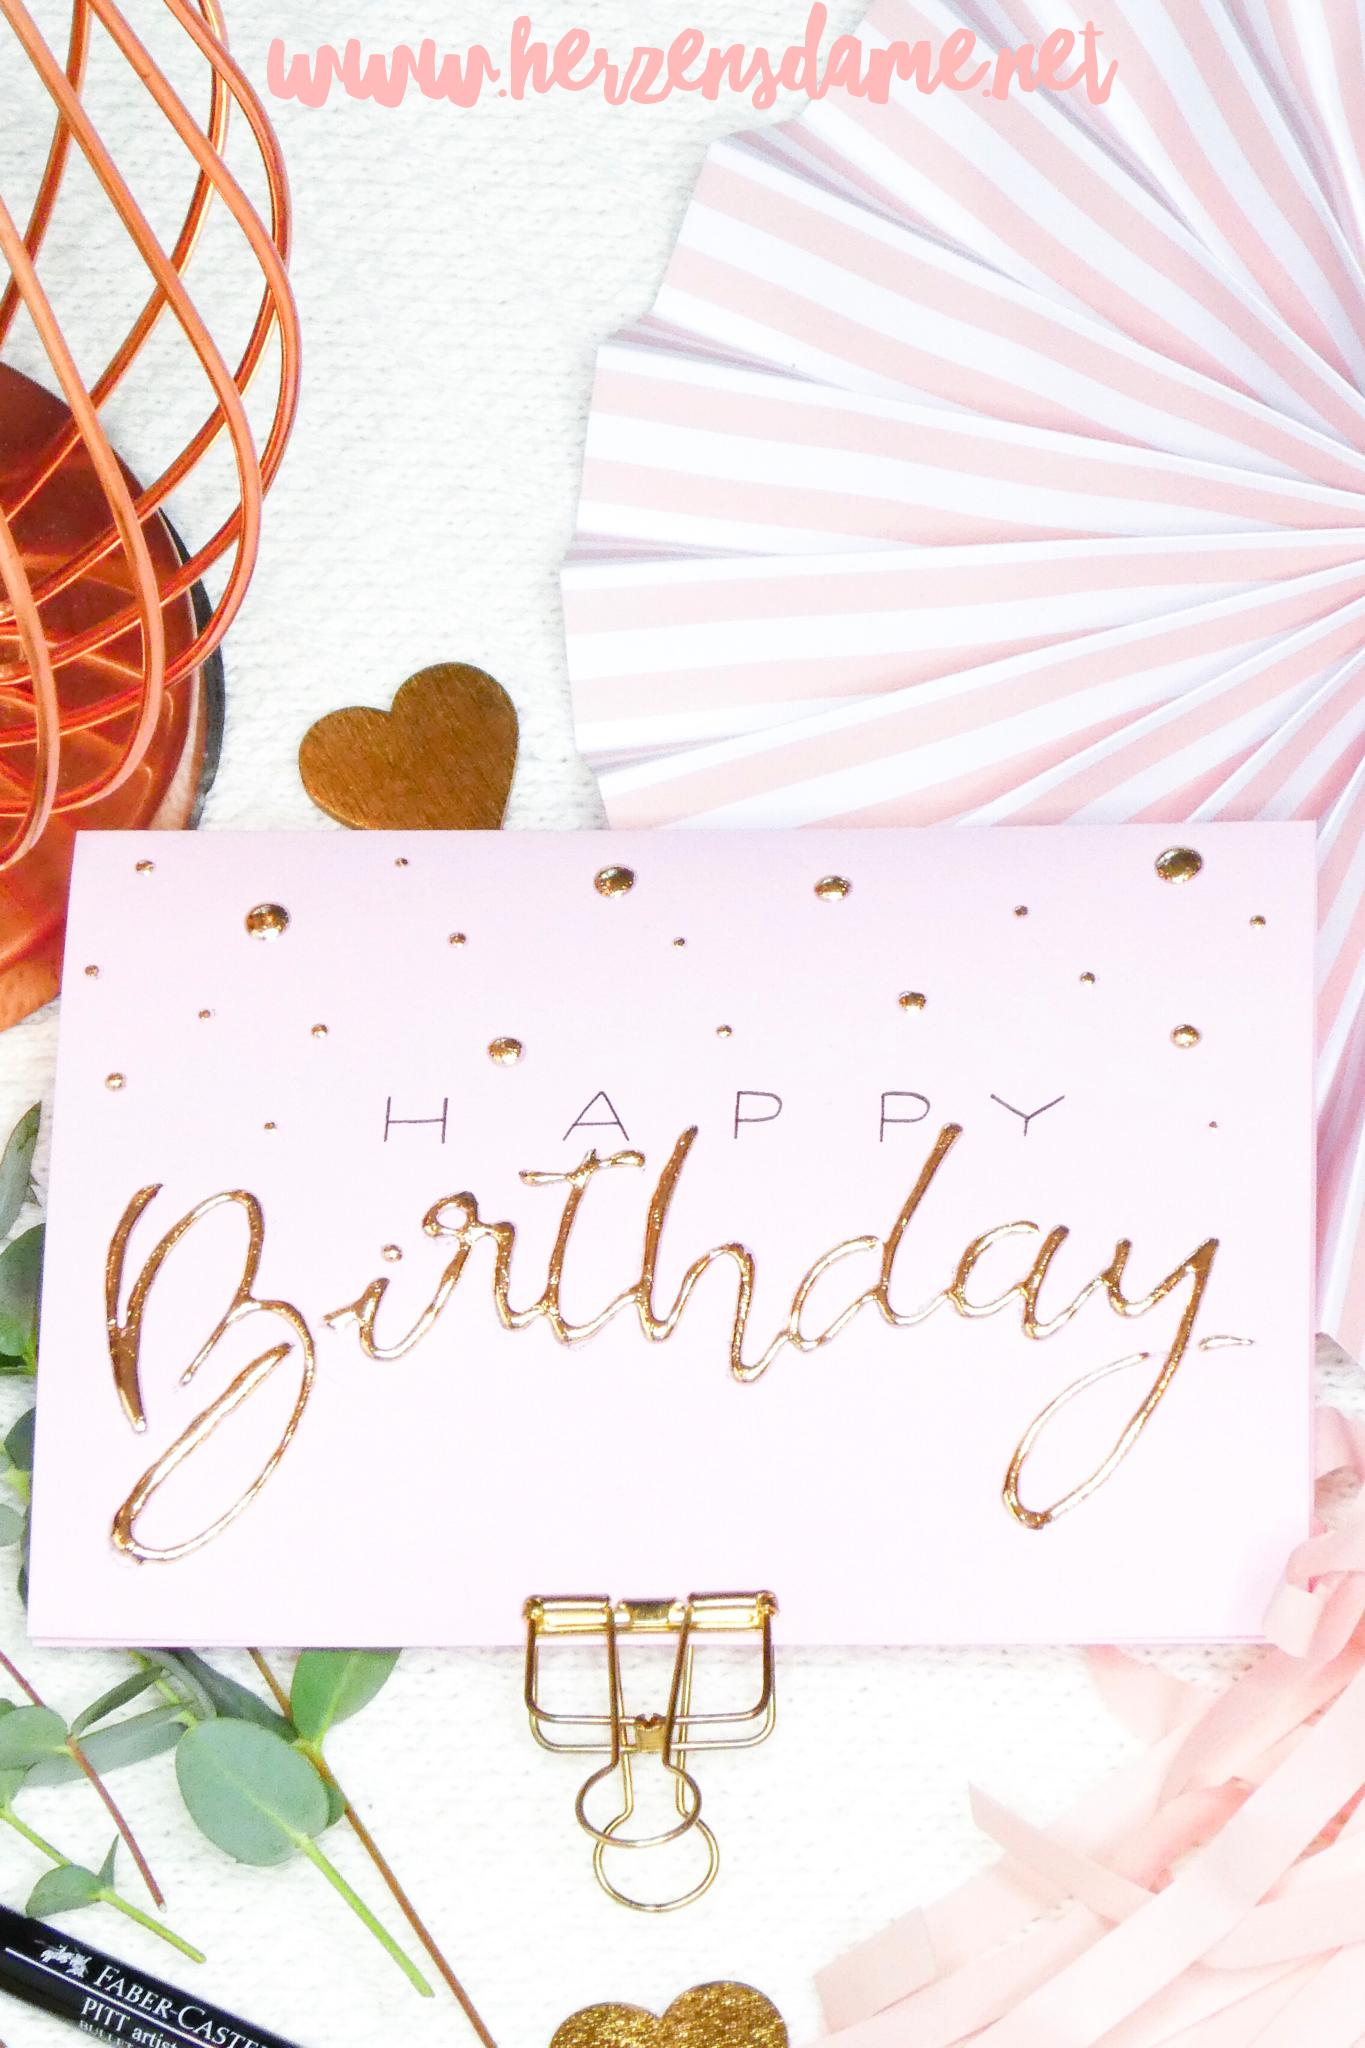 050821ce1c8cd Happy Birthday Geburtstag Geburtstagskarte Karte Geschenk Glückwünsche DIY  Idee Do it yourself selbstgemacht Lettering Handlettering Brushlettering